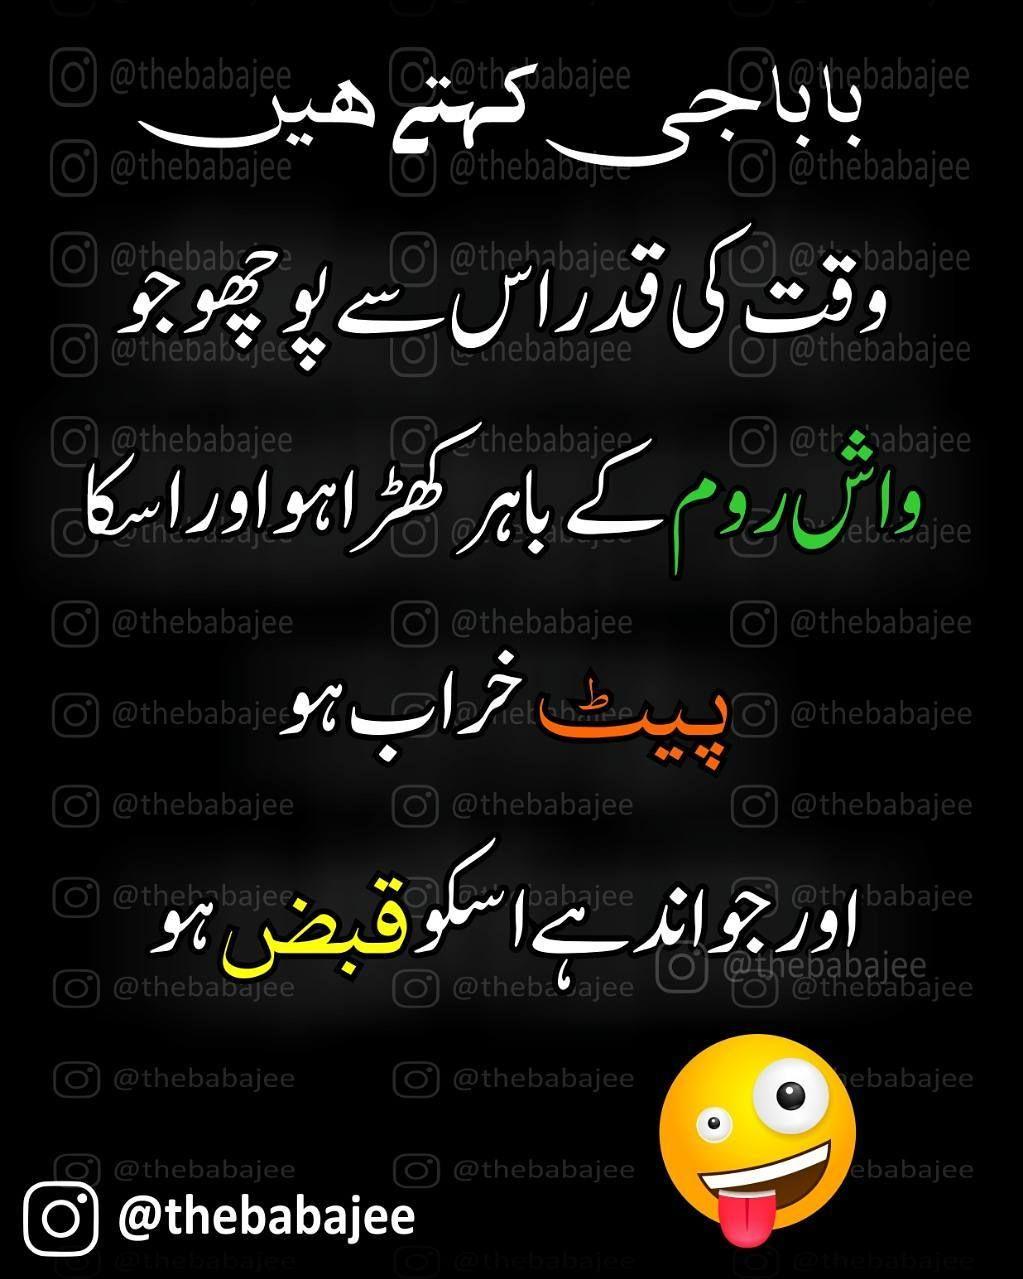 Pin By Angeles Mullane On Shayan Genius English Jokes English Memes Funny Memes